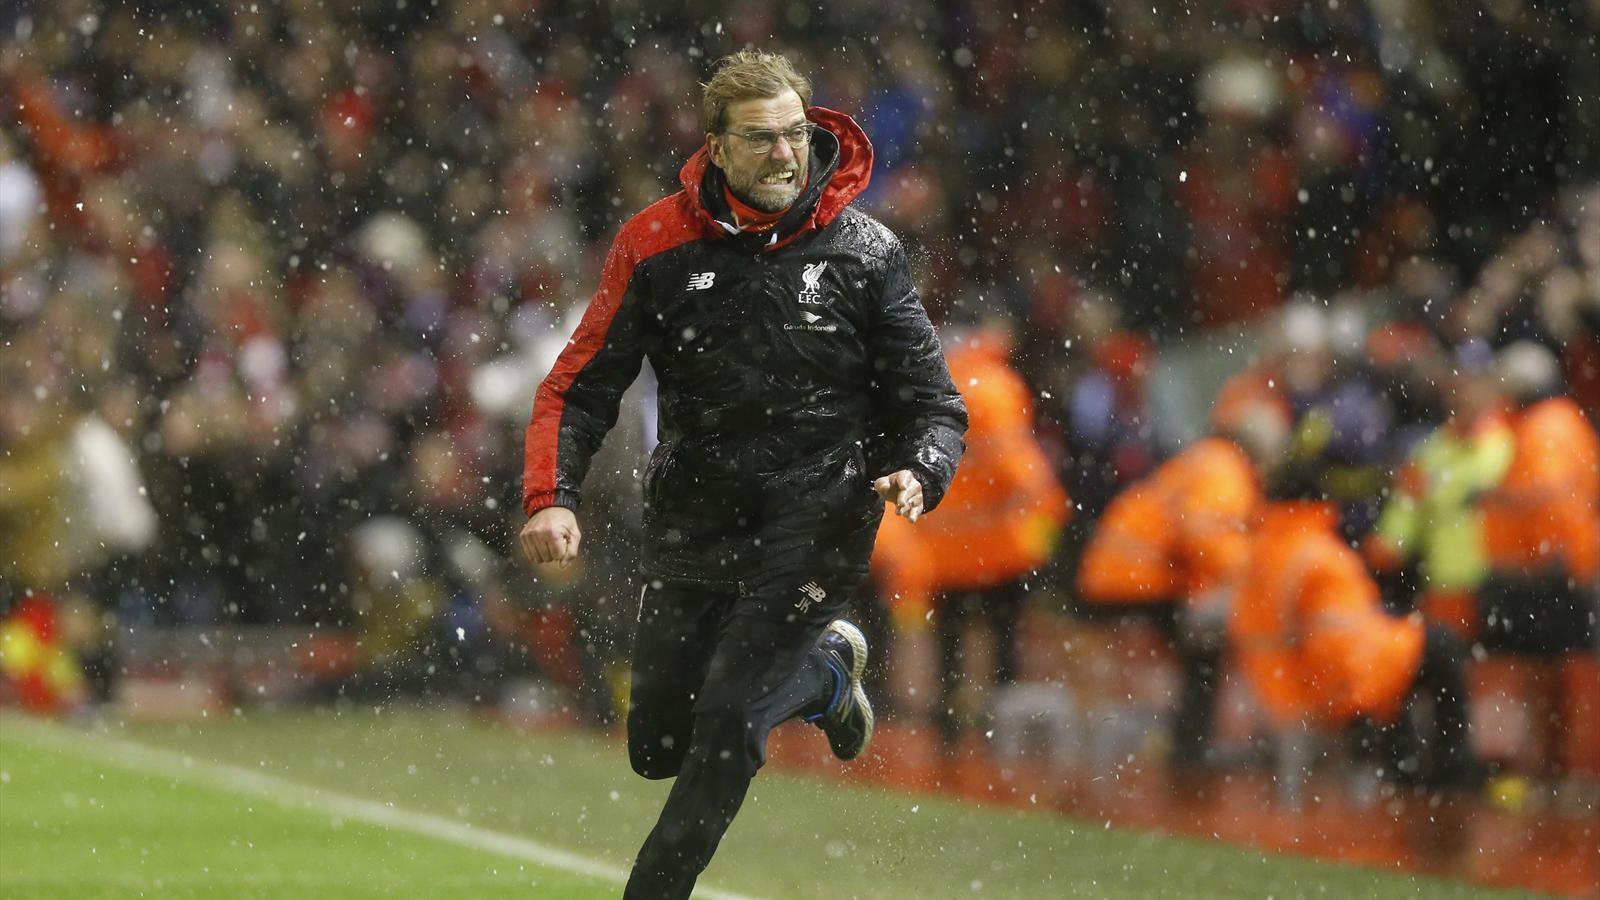 Liverpool manager Jurgen Klopp celebrates after Joe Allen scores against Arsenal